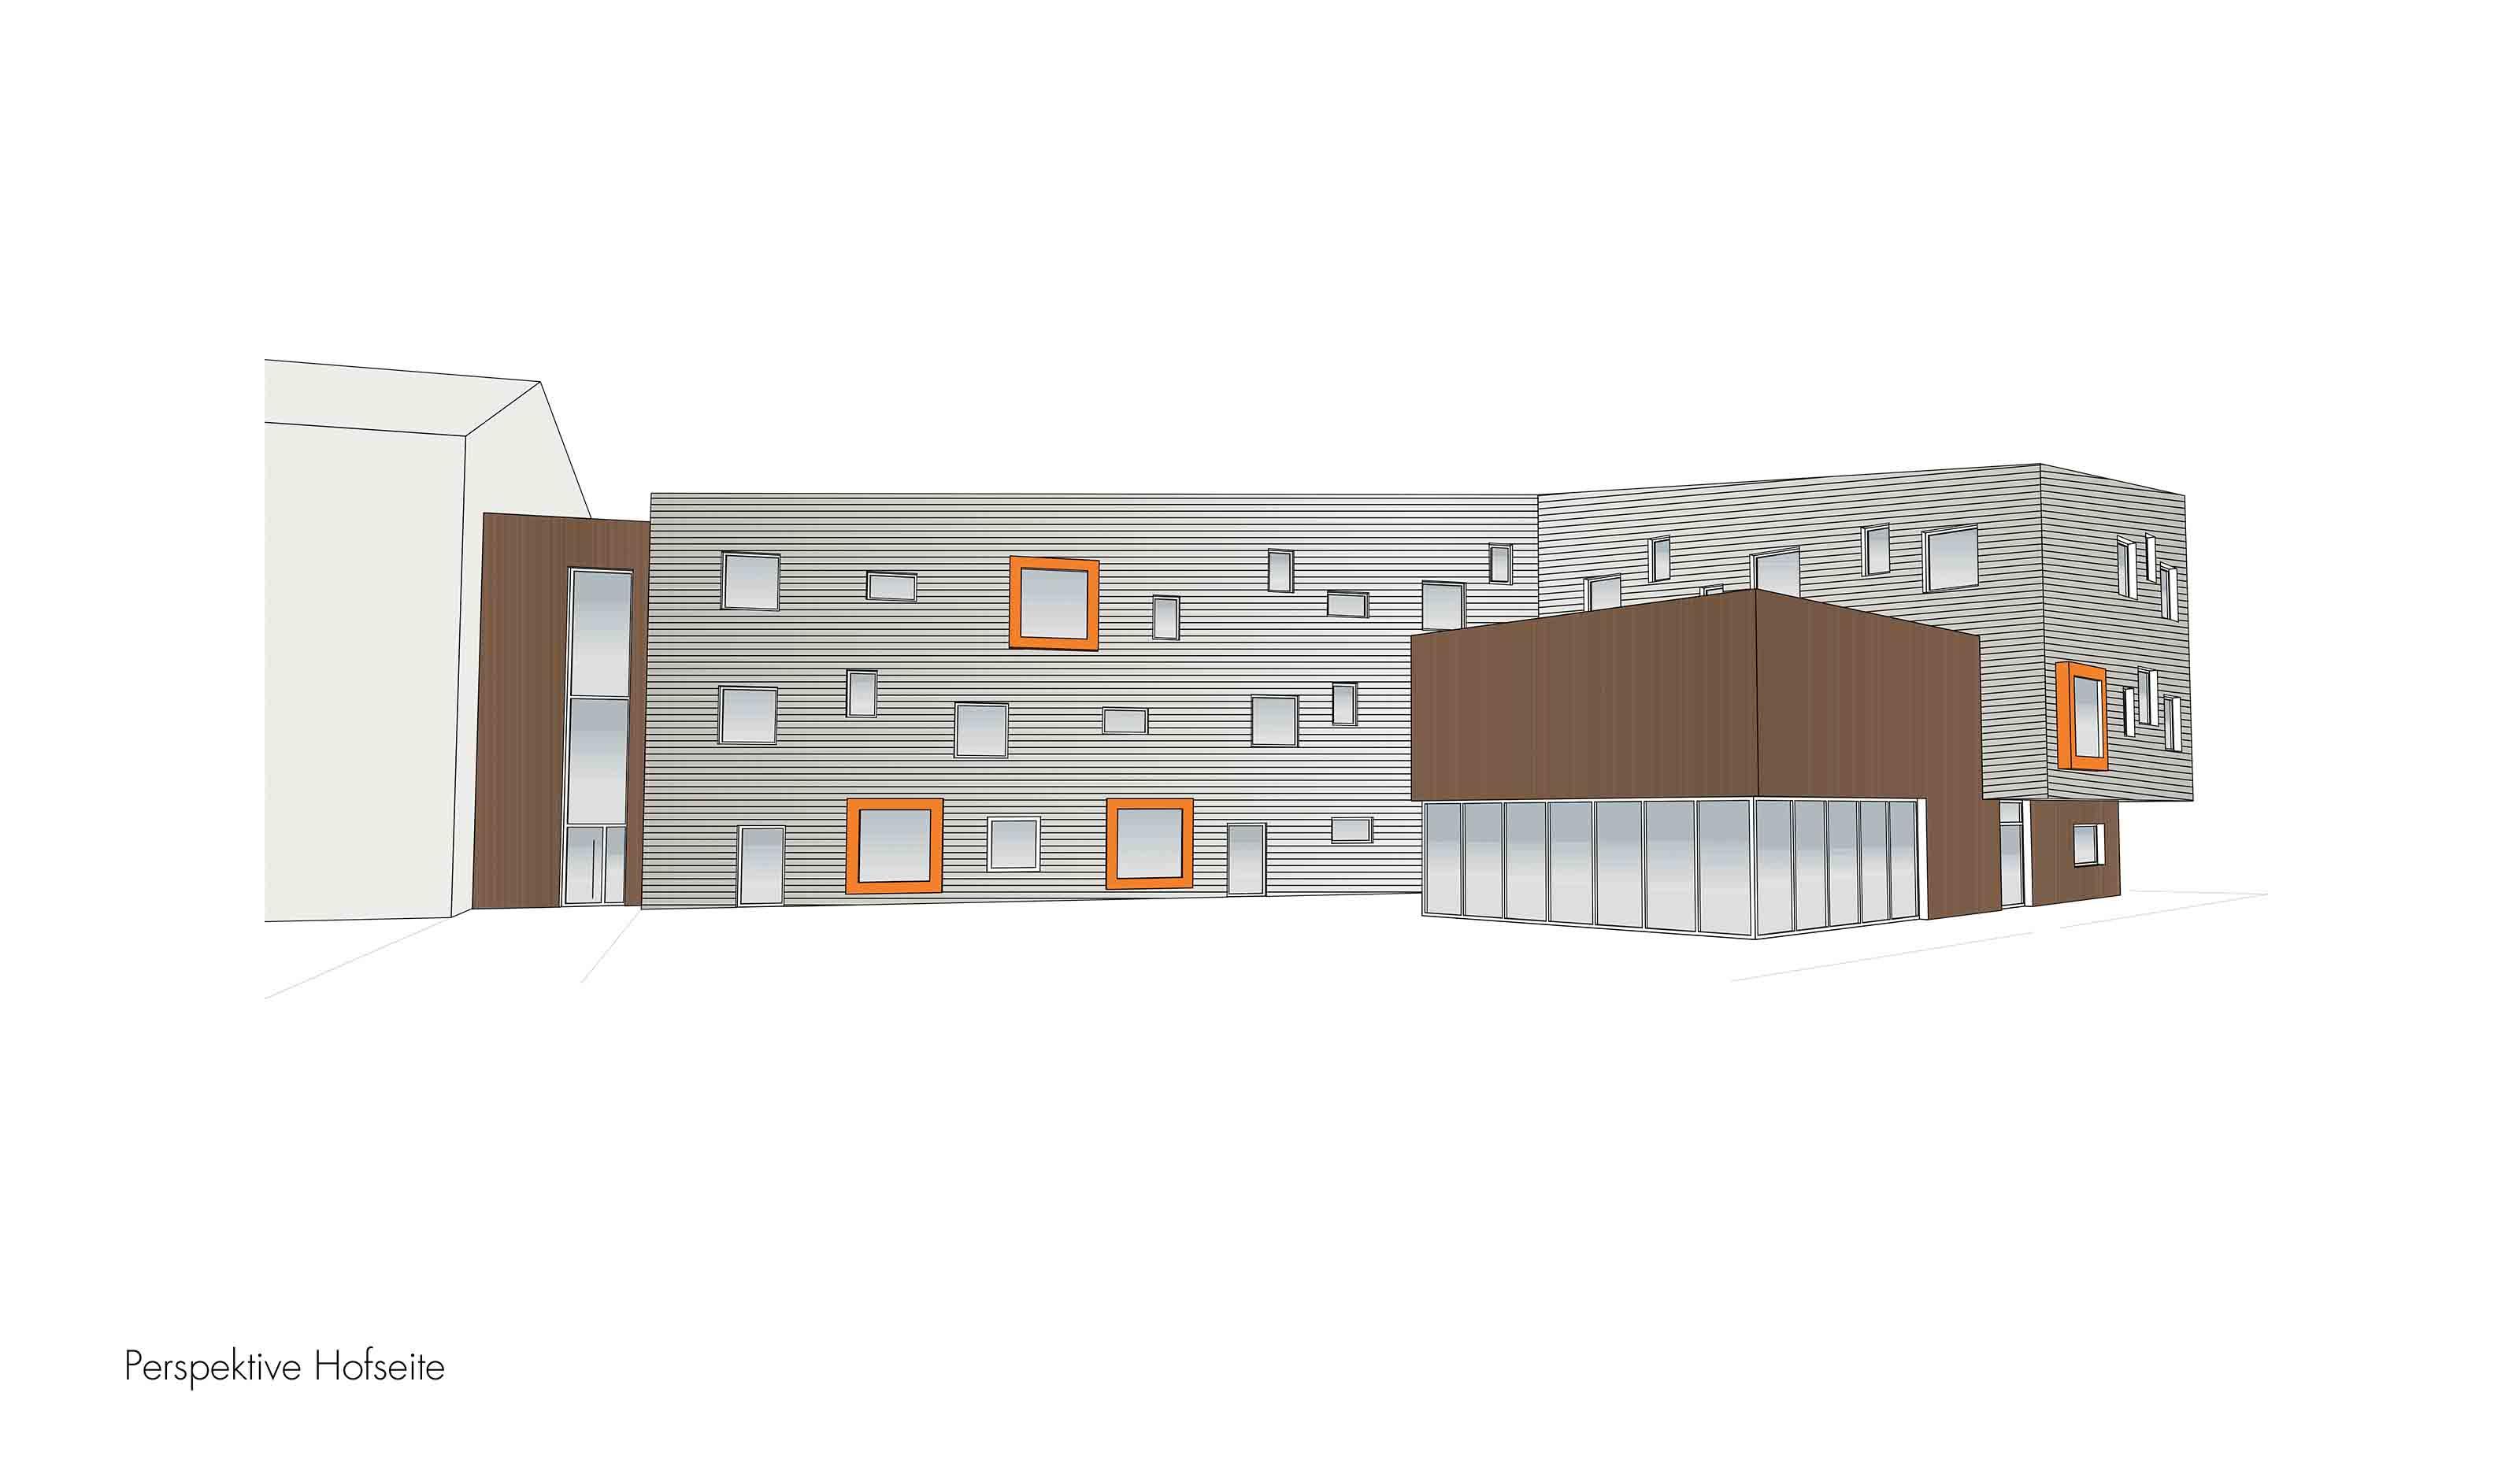 Pespektive-Neubau-eines-Stadtteilzentrums